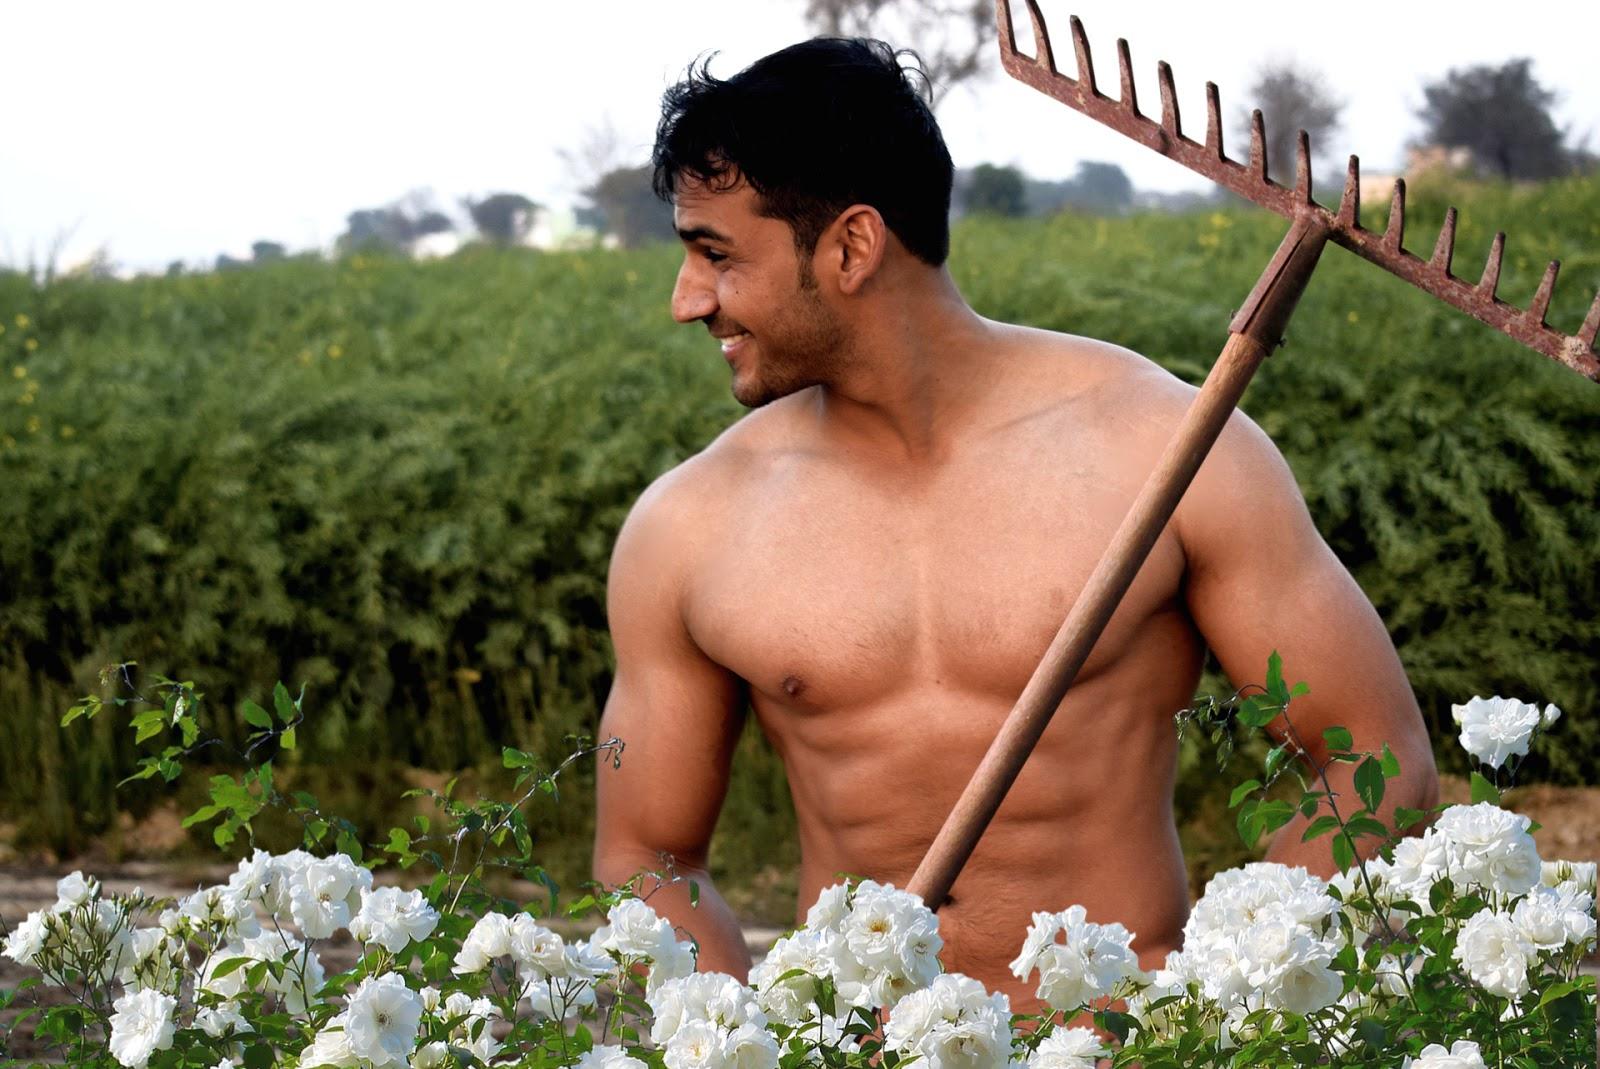 Charles Price naked in his garden | World Naked Gardening